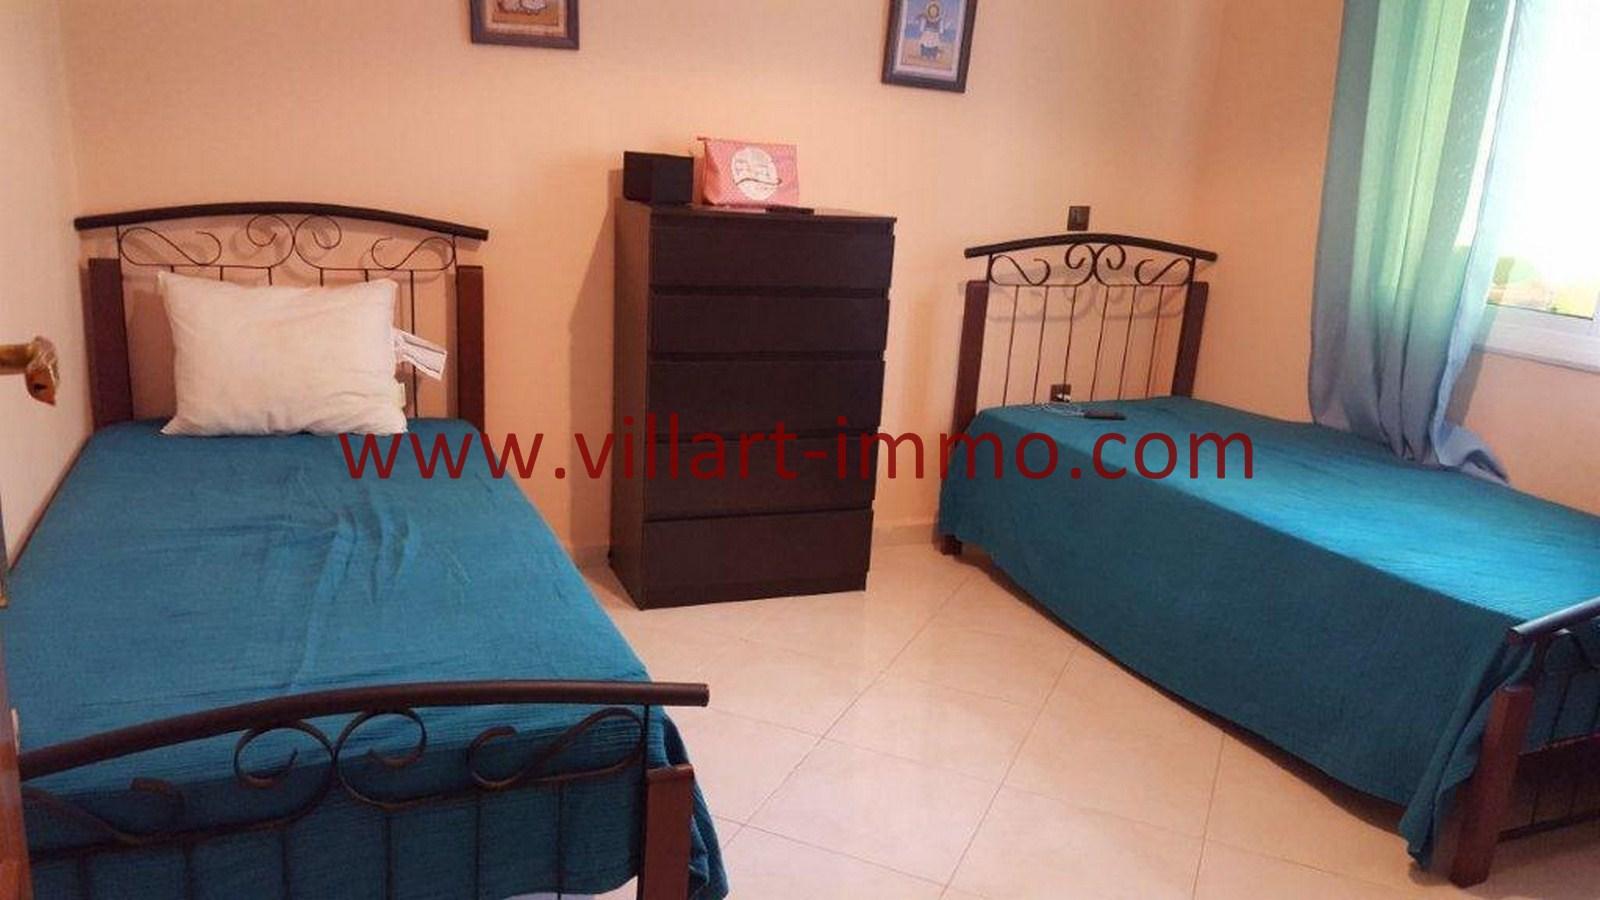 4-Vente-Appartement-Tanger-Chambre à Coucher 2-VA509-Villart Immo